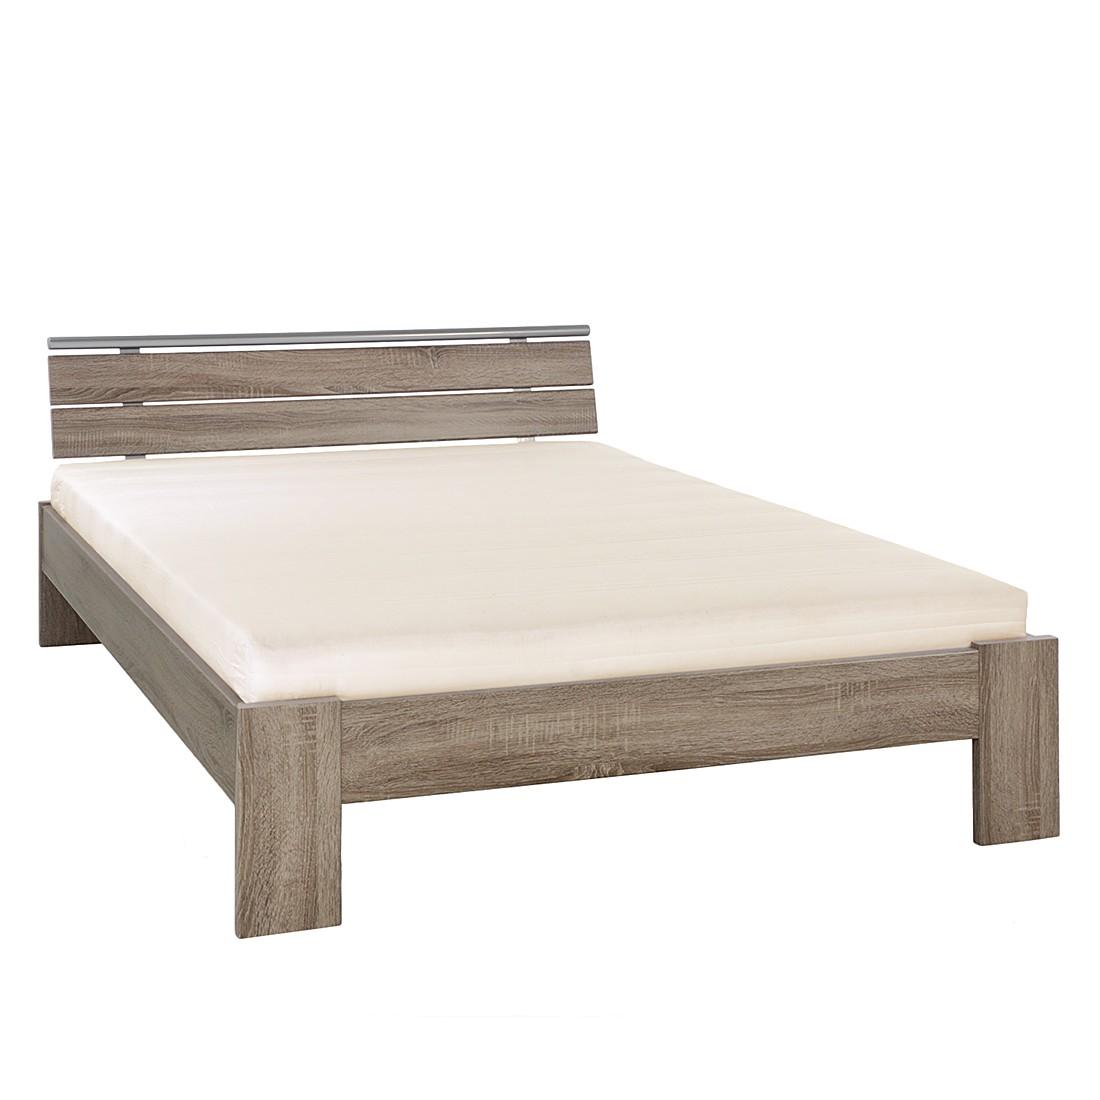 bett megan 140 x 200cm bettgestell ohne matratze lattenrost tr ffeleiche dekor home. Black Bedroom Furniture Sets. Home Design Ideas